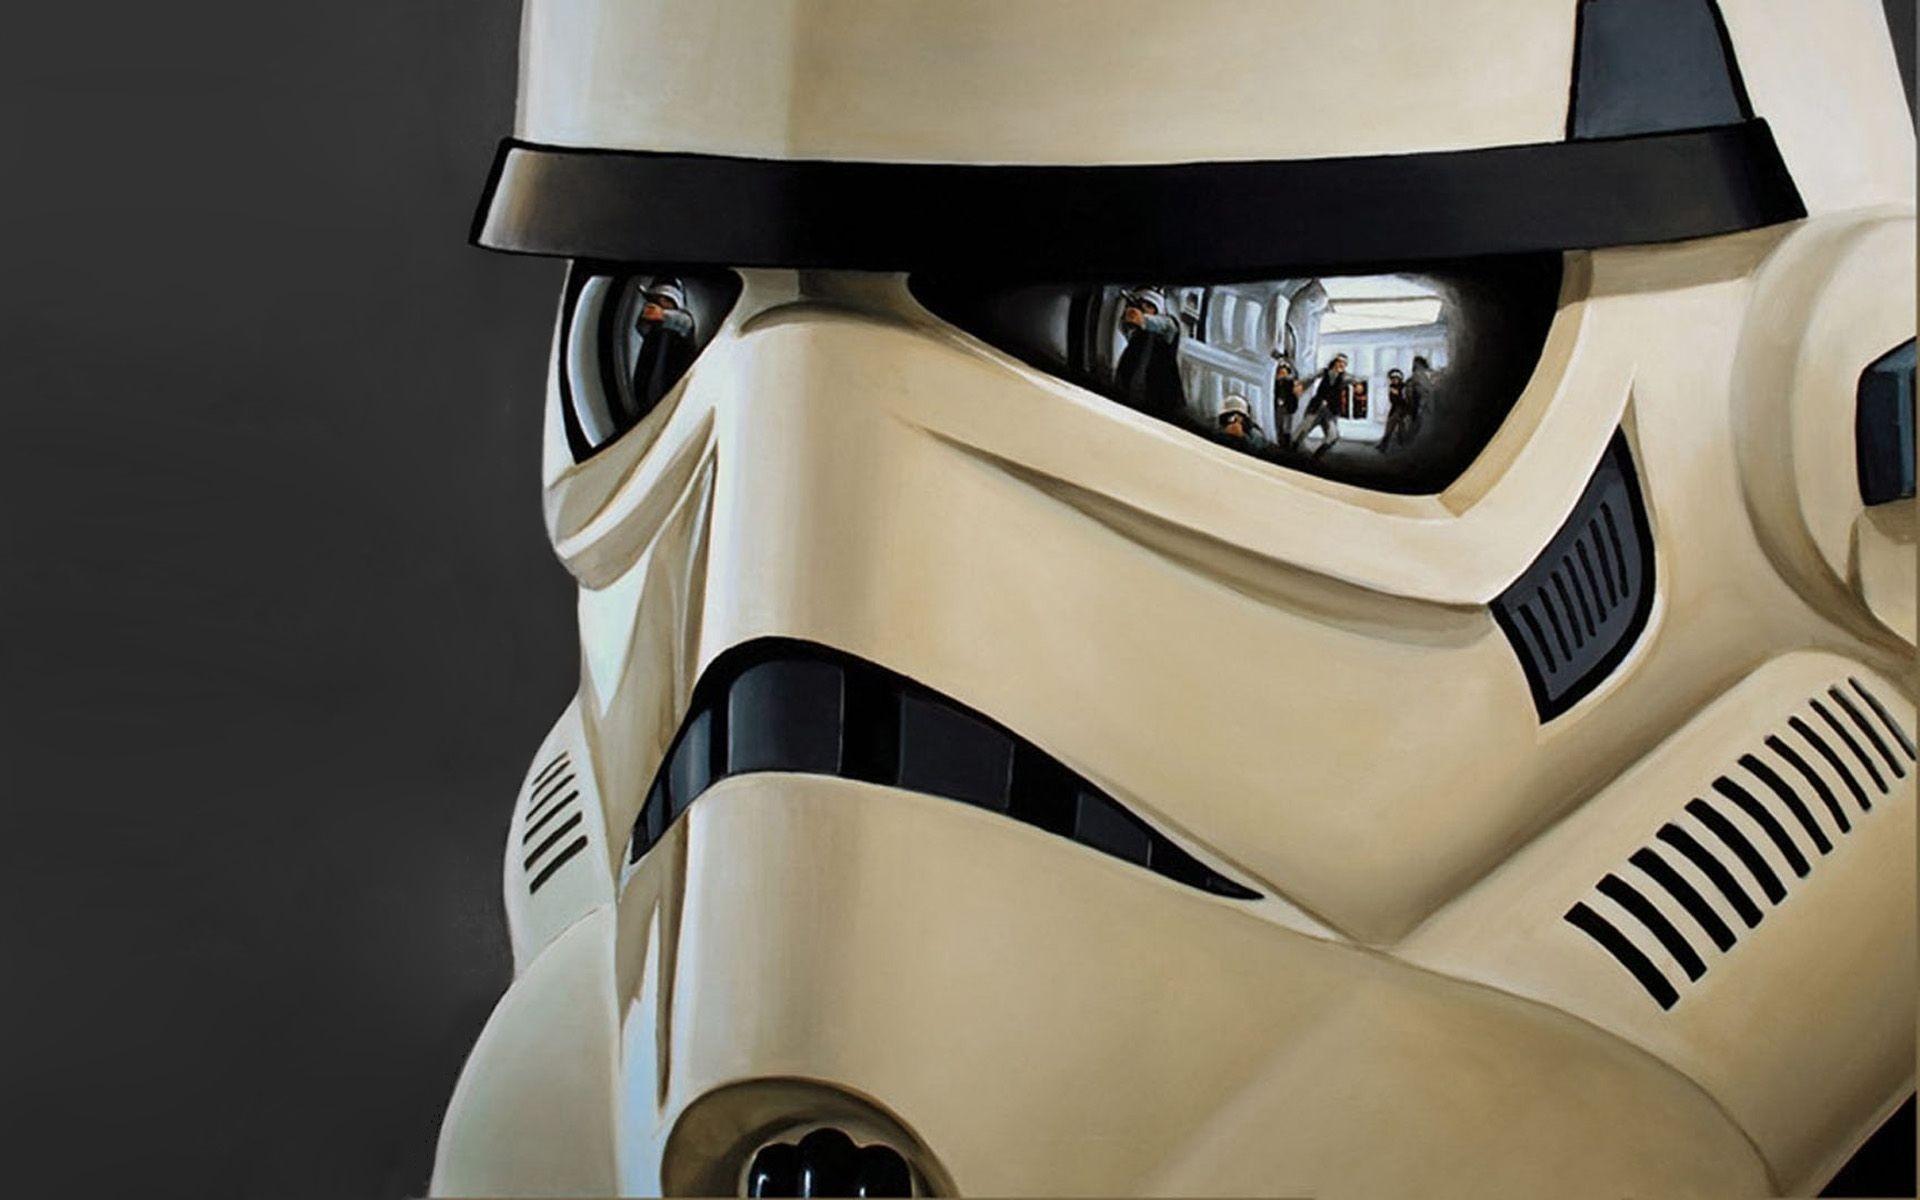 516 Stormtrooper helmet Trooper Wallpapers – Full HD wallpaper search –  page 2